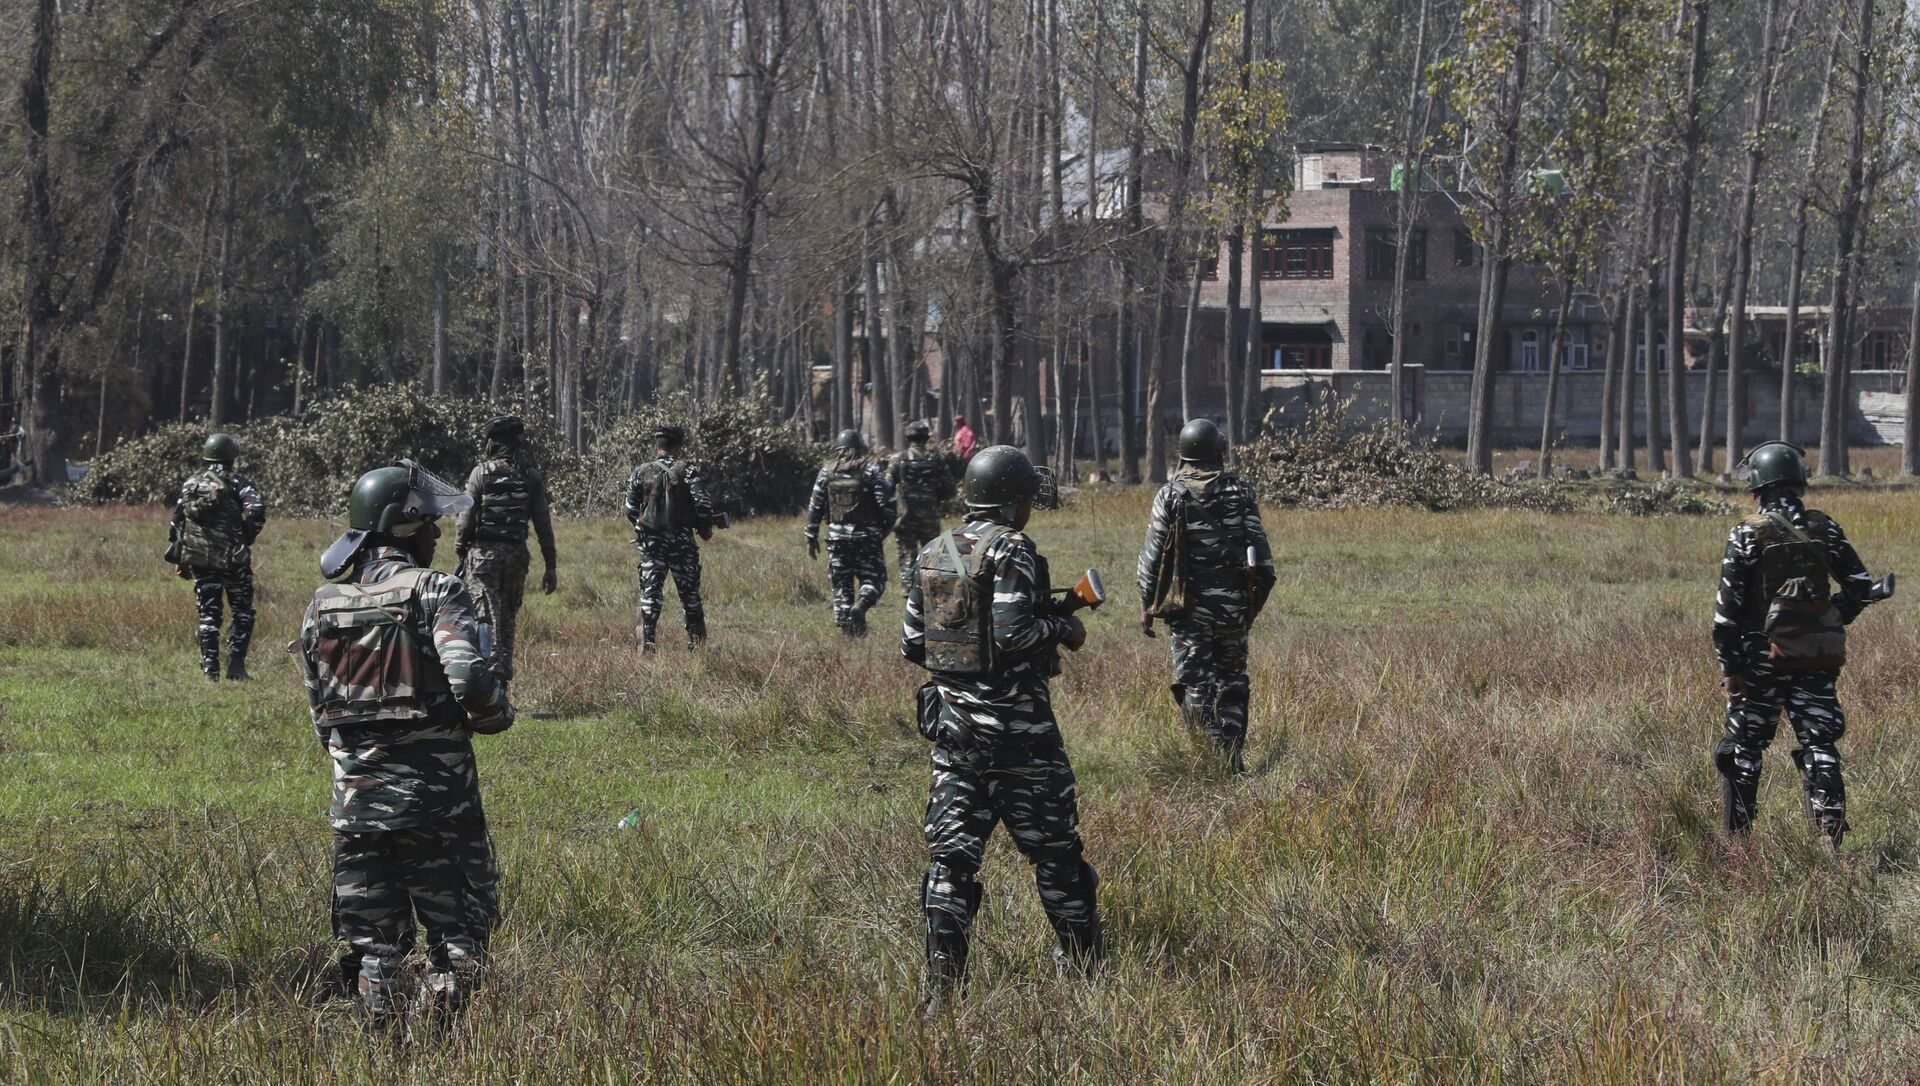 Indian paramilitary soldiers patrol near the site of a gunbattle in Bijbehara, south of Srinagar, Indian controlled Kashmir, Wednesday, Oct. 16, 2019 - Sputnik International, 1920, 23.07.2021